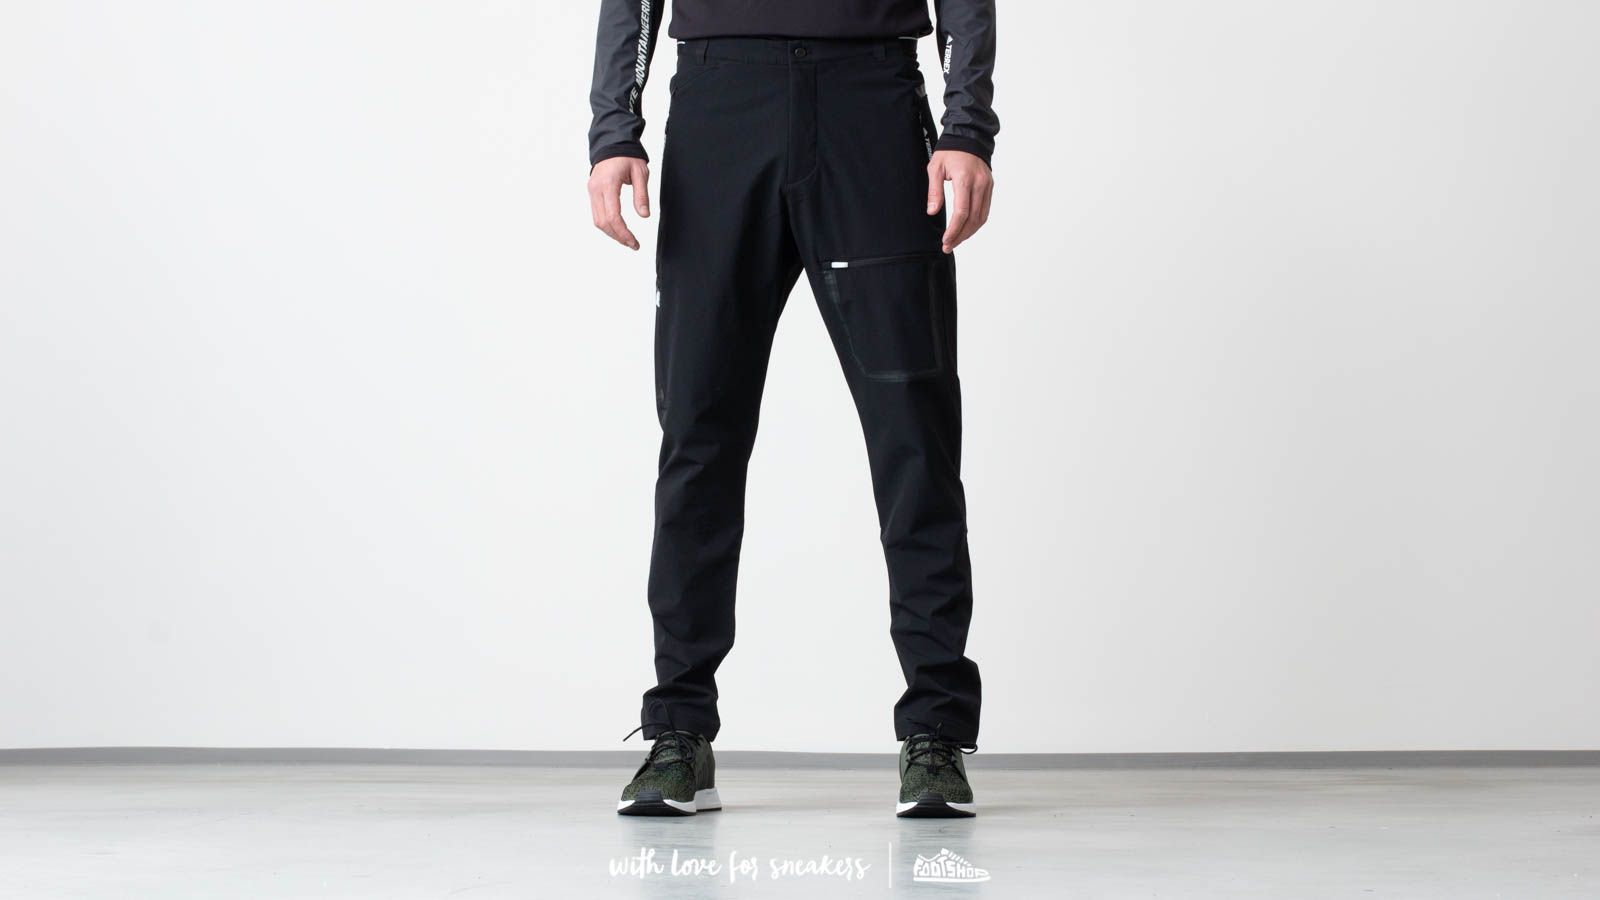 adidas Terrex x White Mountaineering Pants Black | Footshop